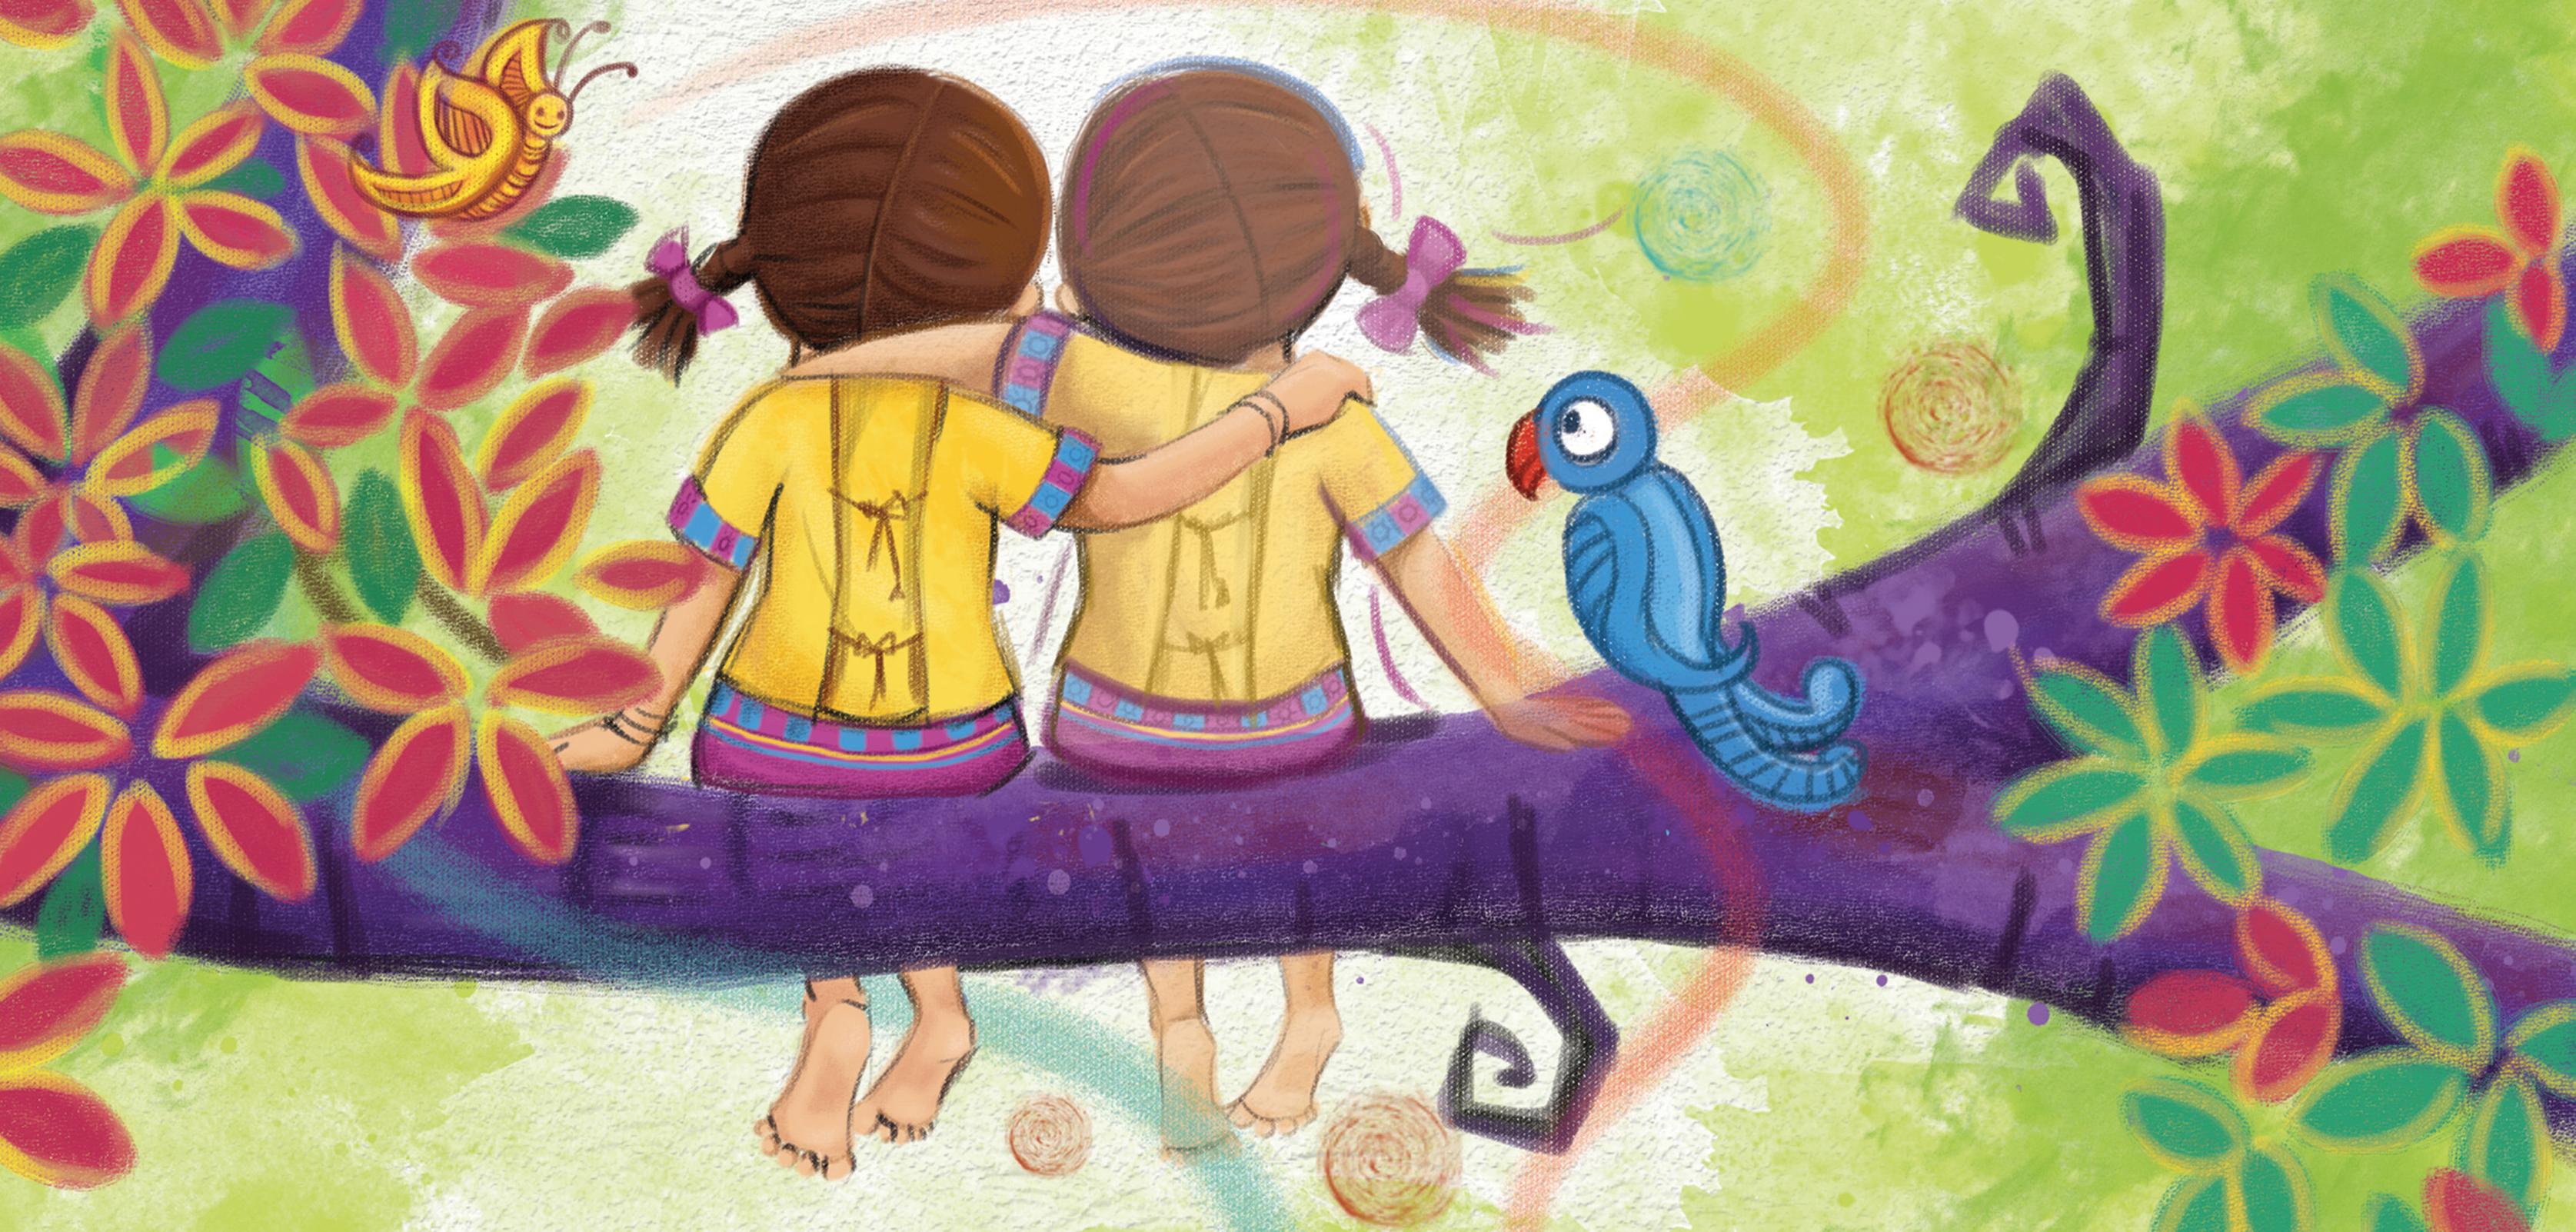 Resultado de imagen de two girls and tree painting